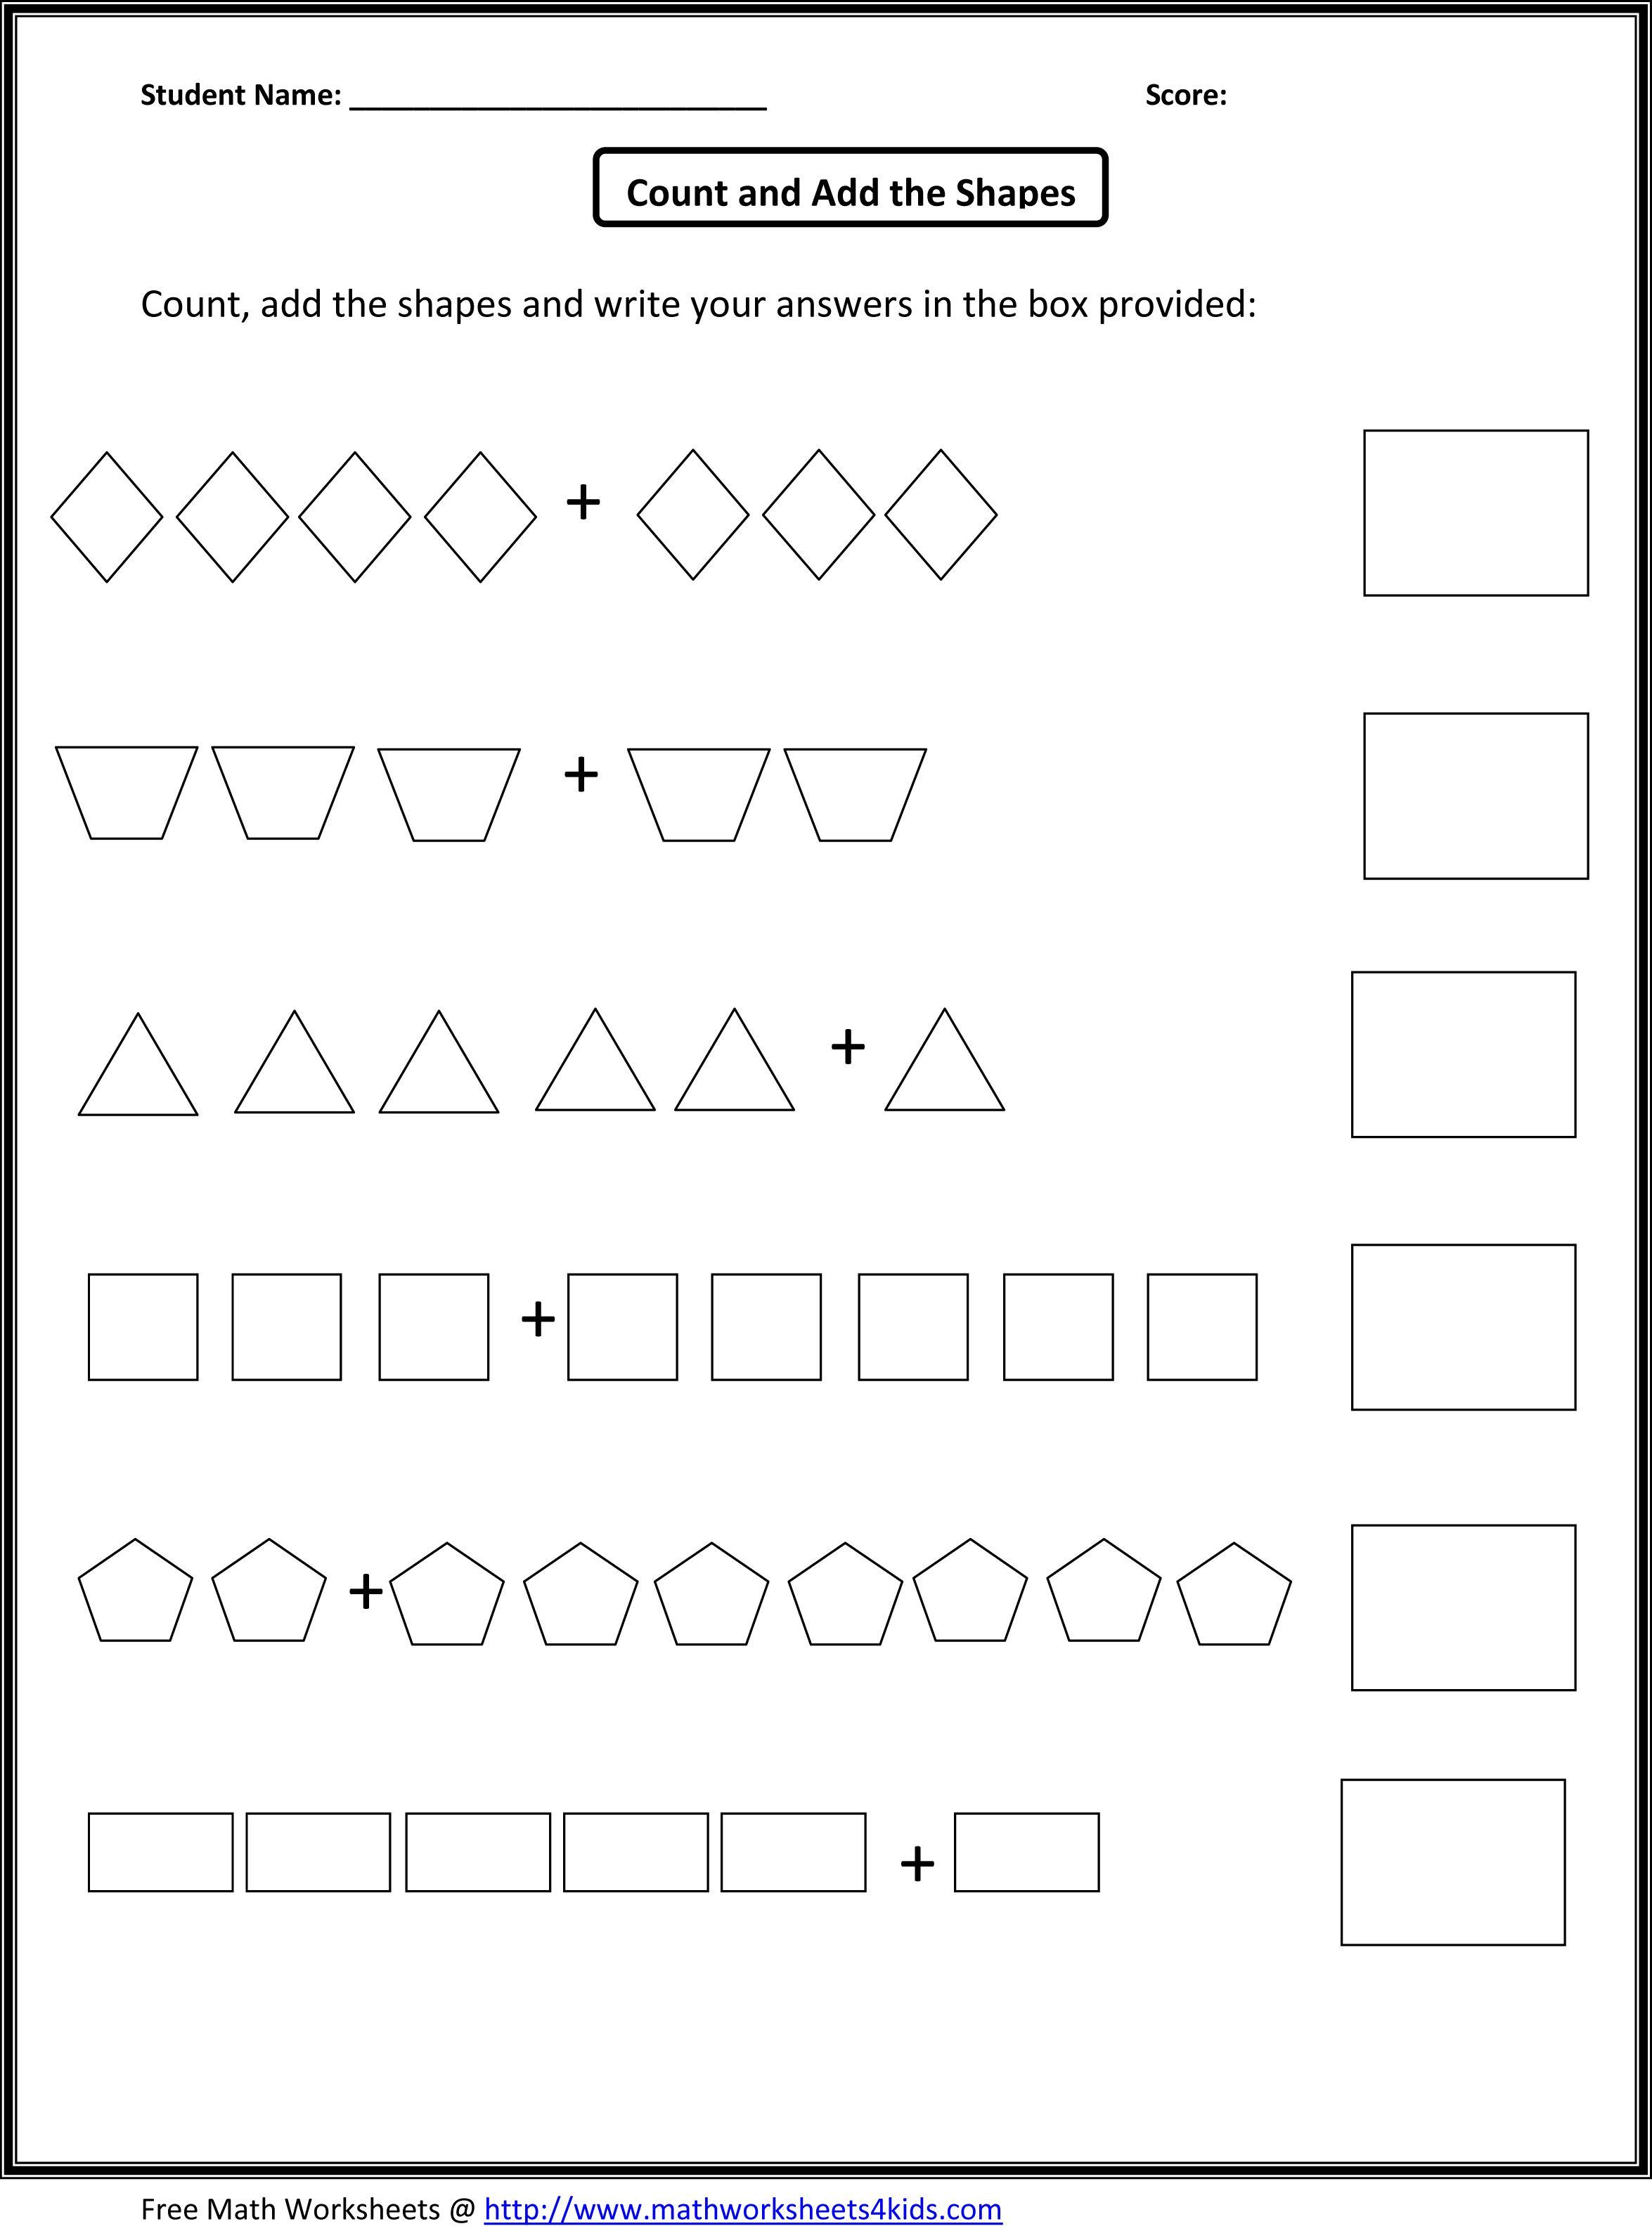 Printable K5 Math Worksheets